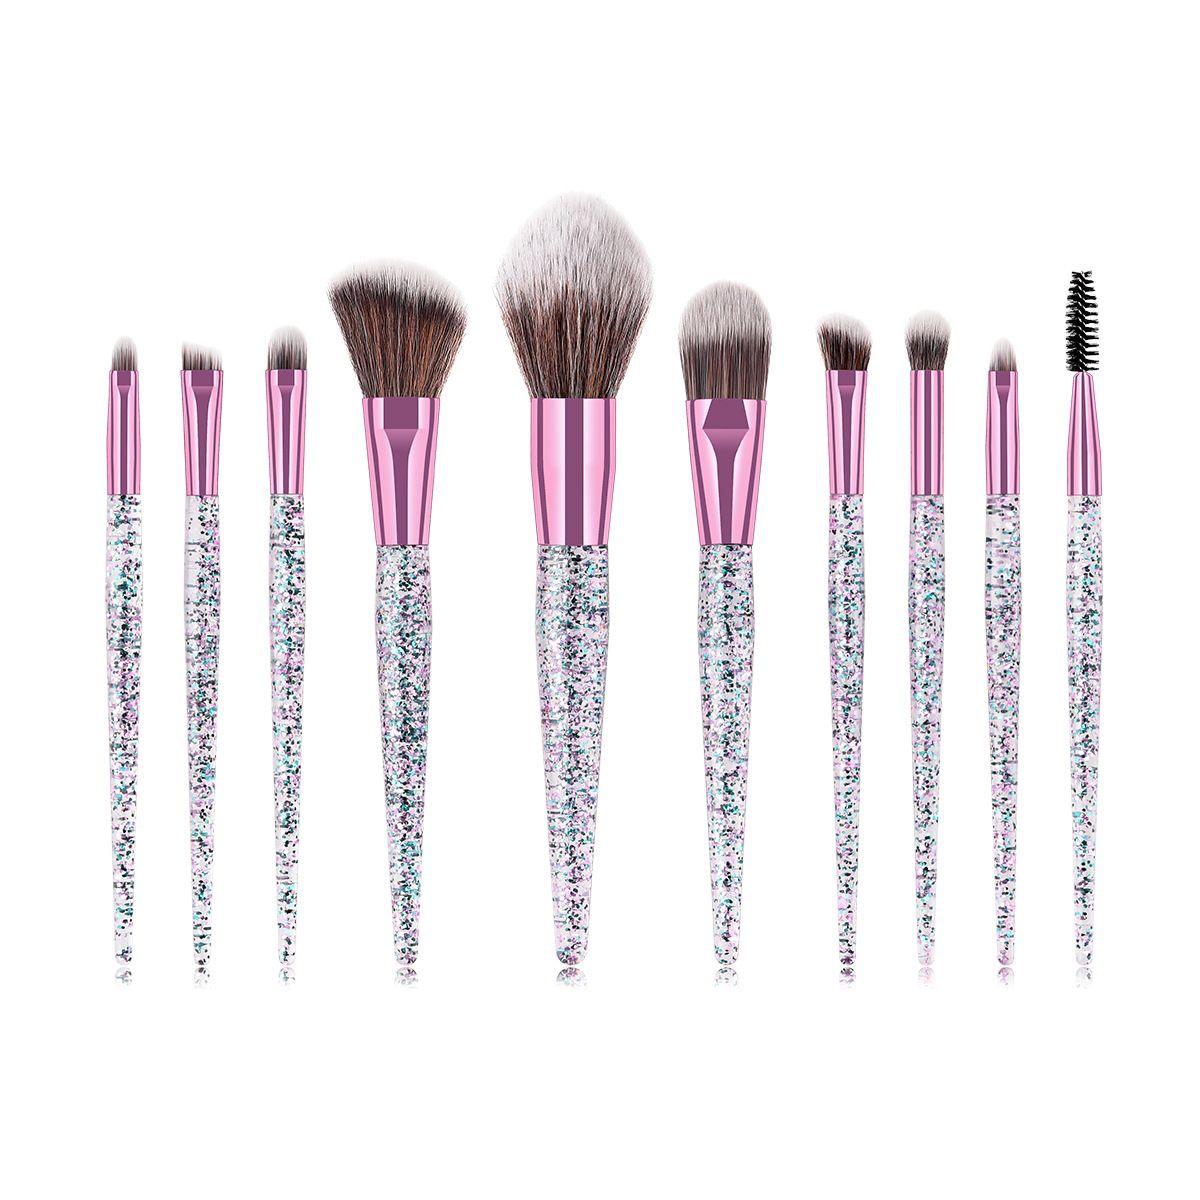 34cd08f3f1a Glitter Crystal Makeup Brushes Set Eye Shadow Concealer Eyelash Foundation  Face Brush With Glitter Sequins Handle Makeup Brush Kit Bridal Makeup Eye  Makeup ...